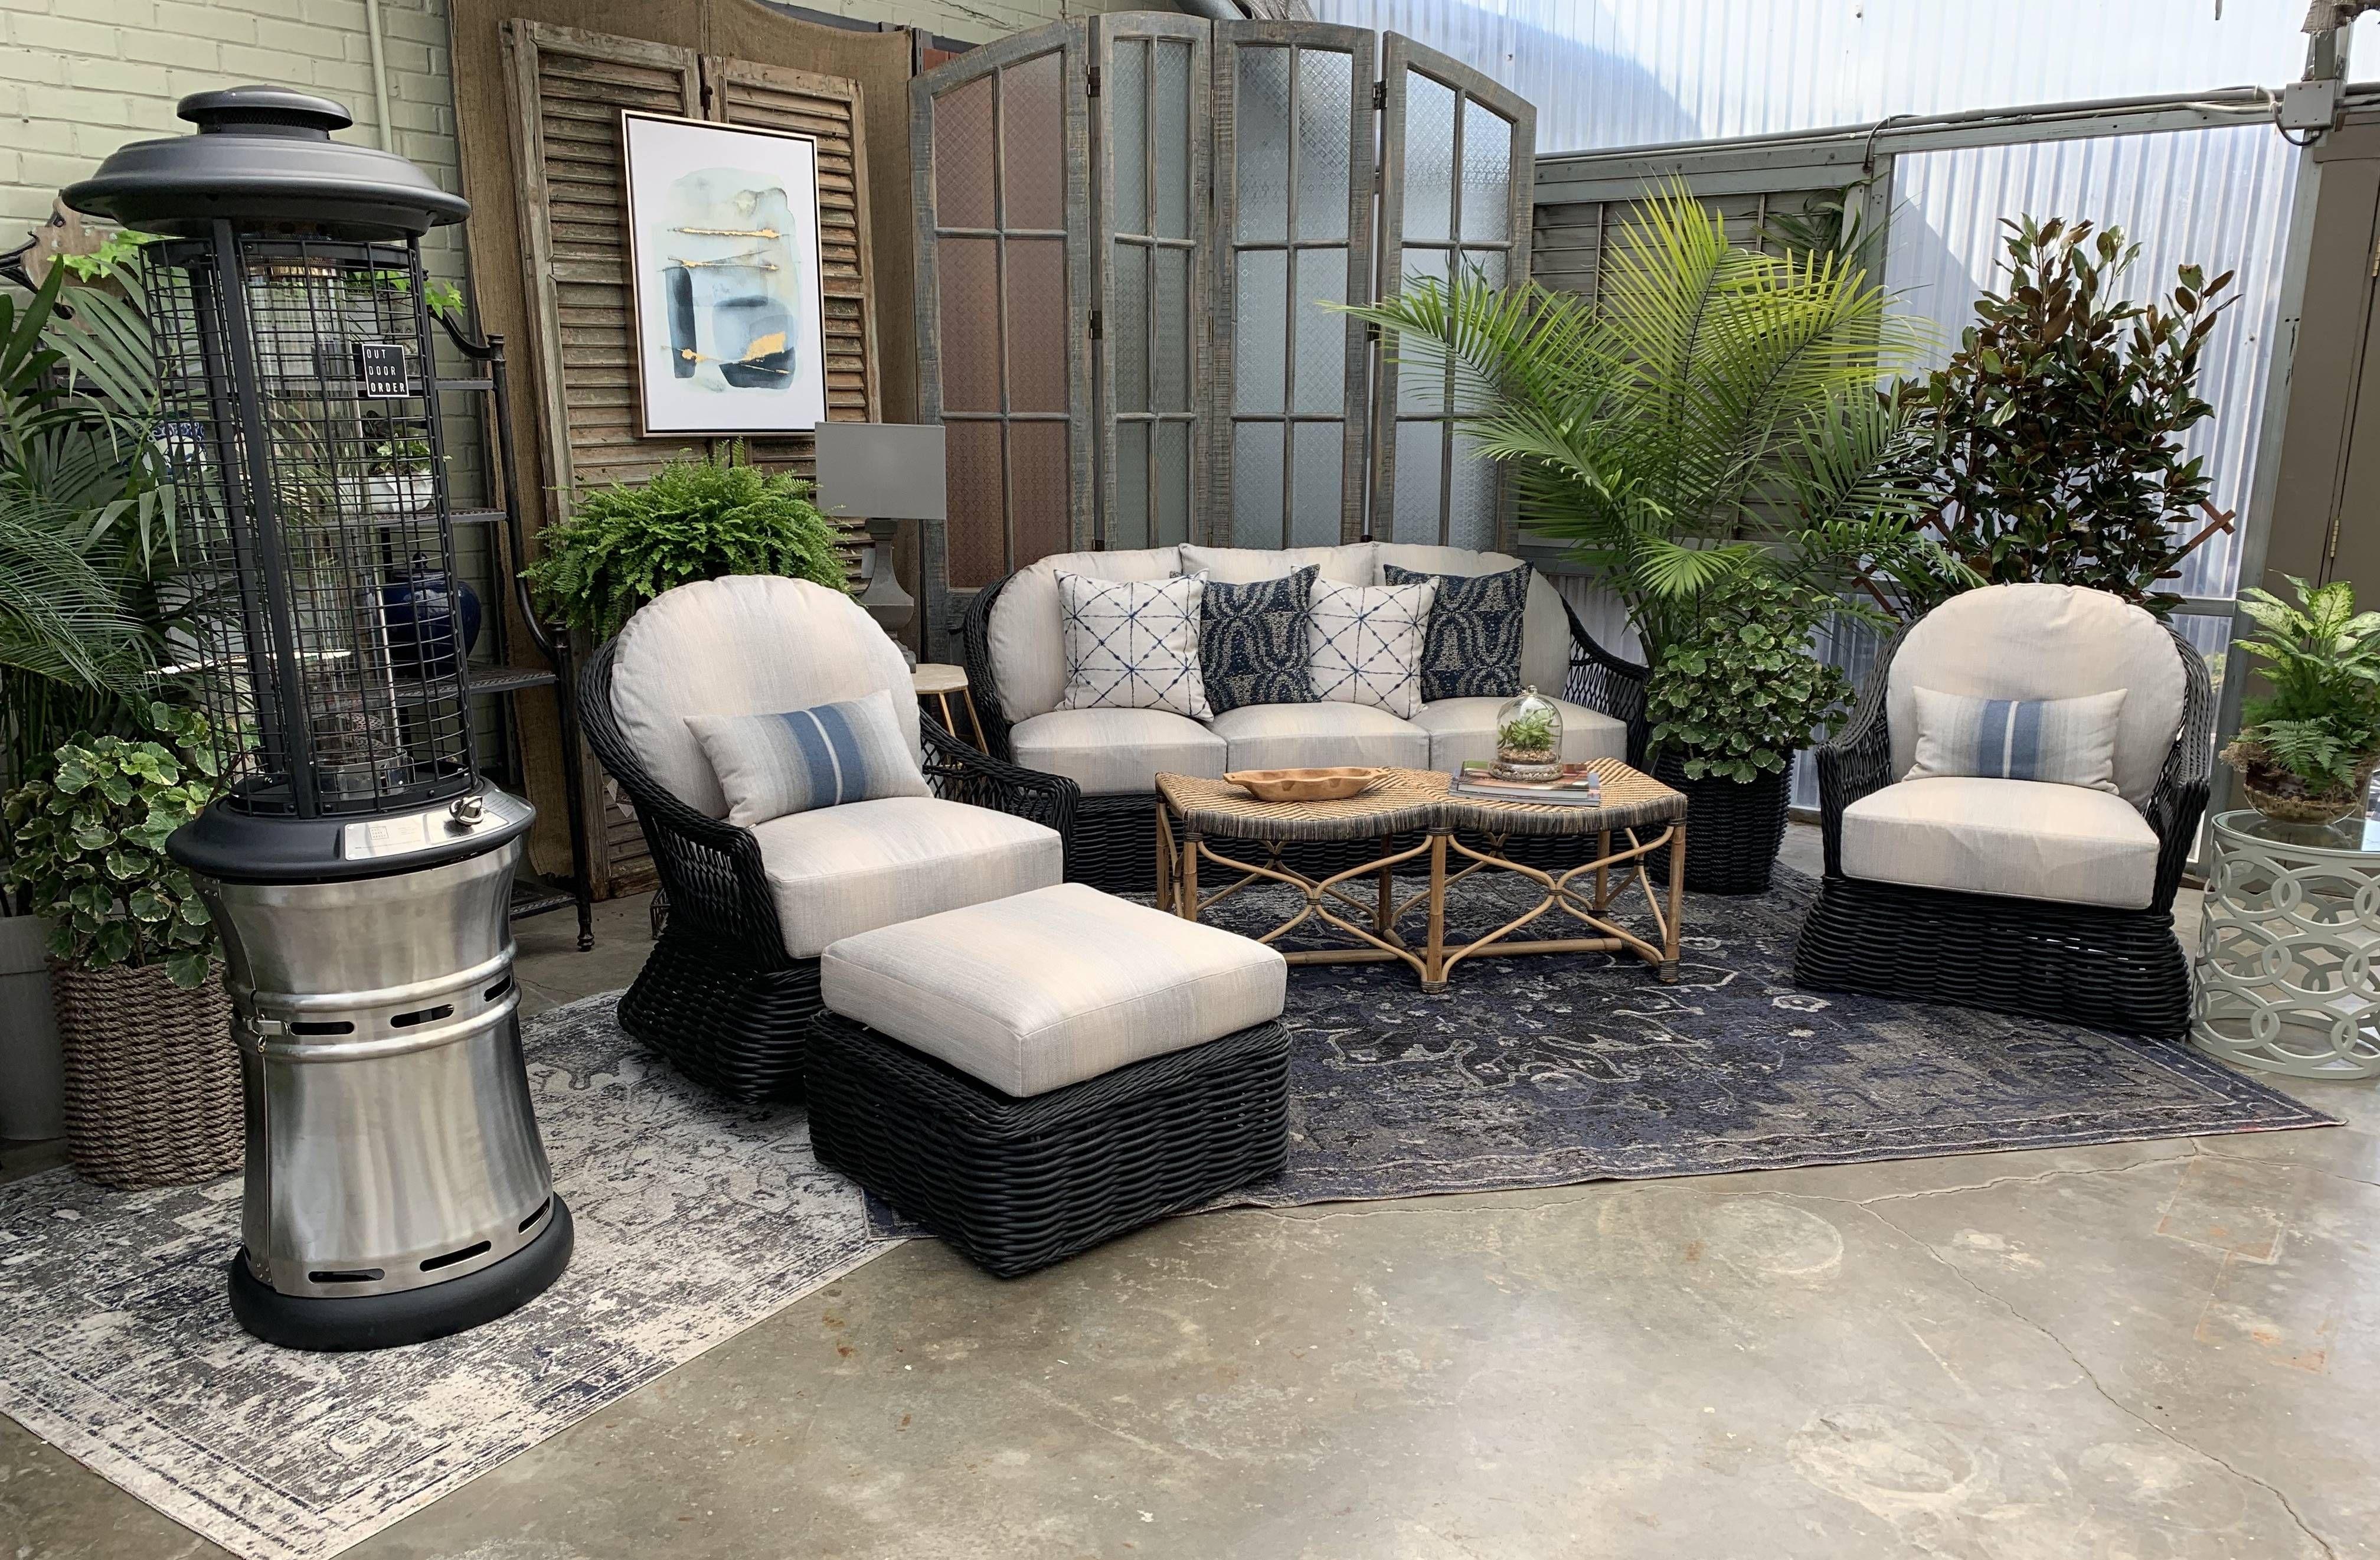 Inspirational Home Decor Floor Vases Discount Patio Furniture